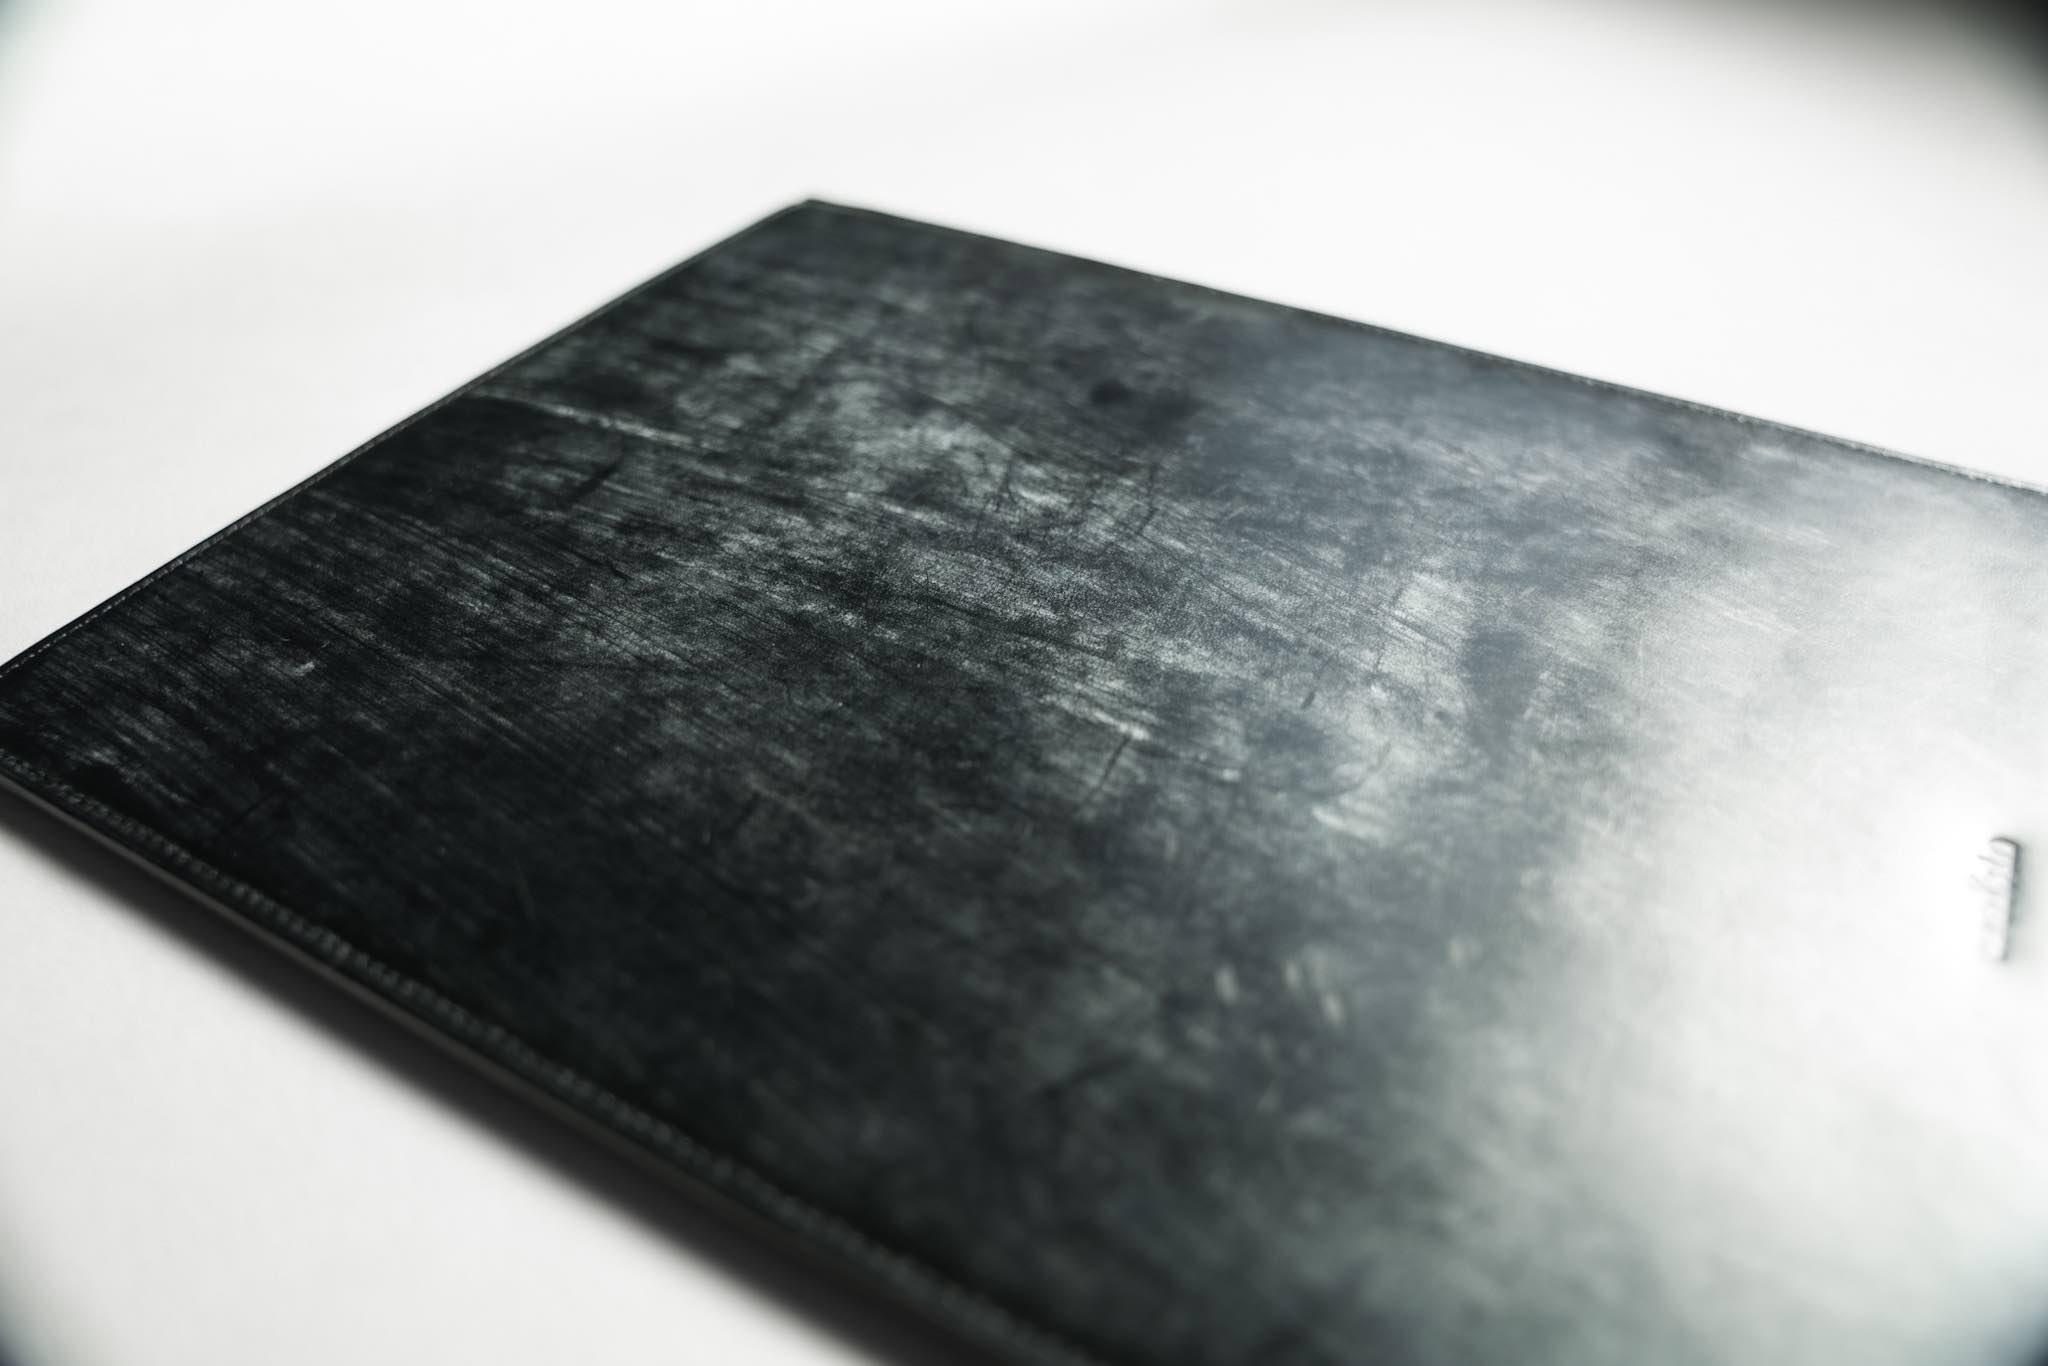 crafsto(クラフスト) MacBook用スリーブケース|特有の艶と光沢、英国製最高級ブライドルレザーを採用